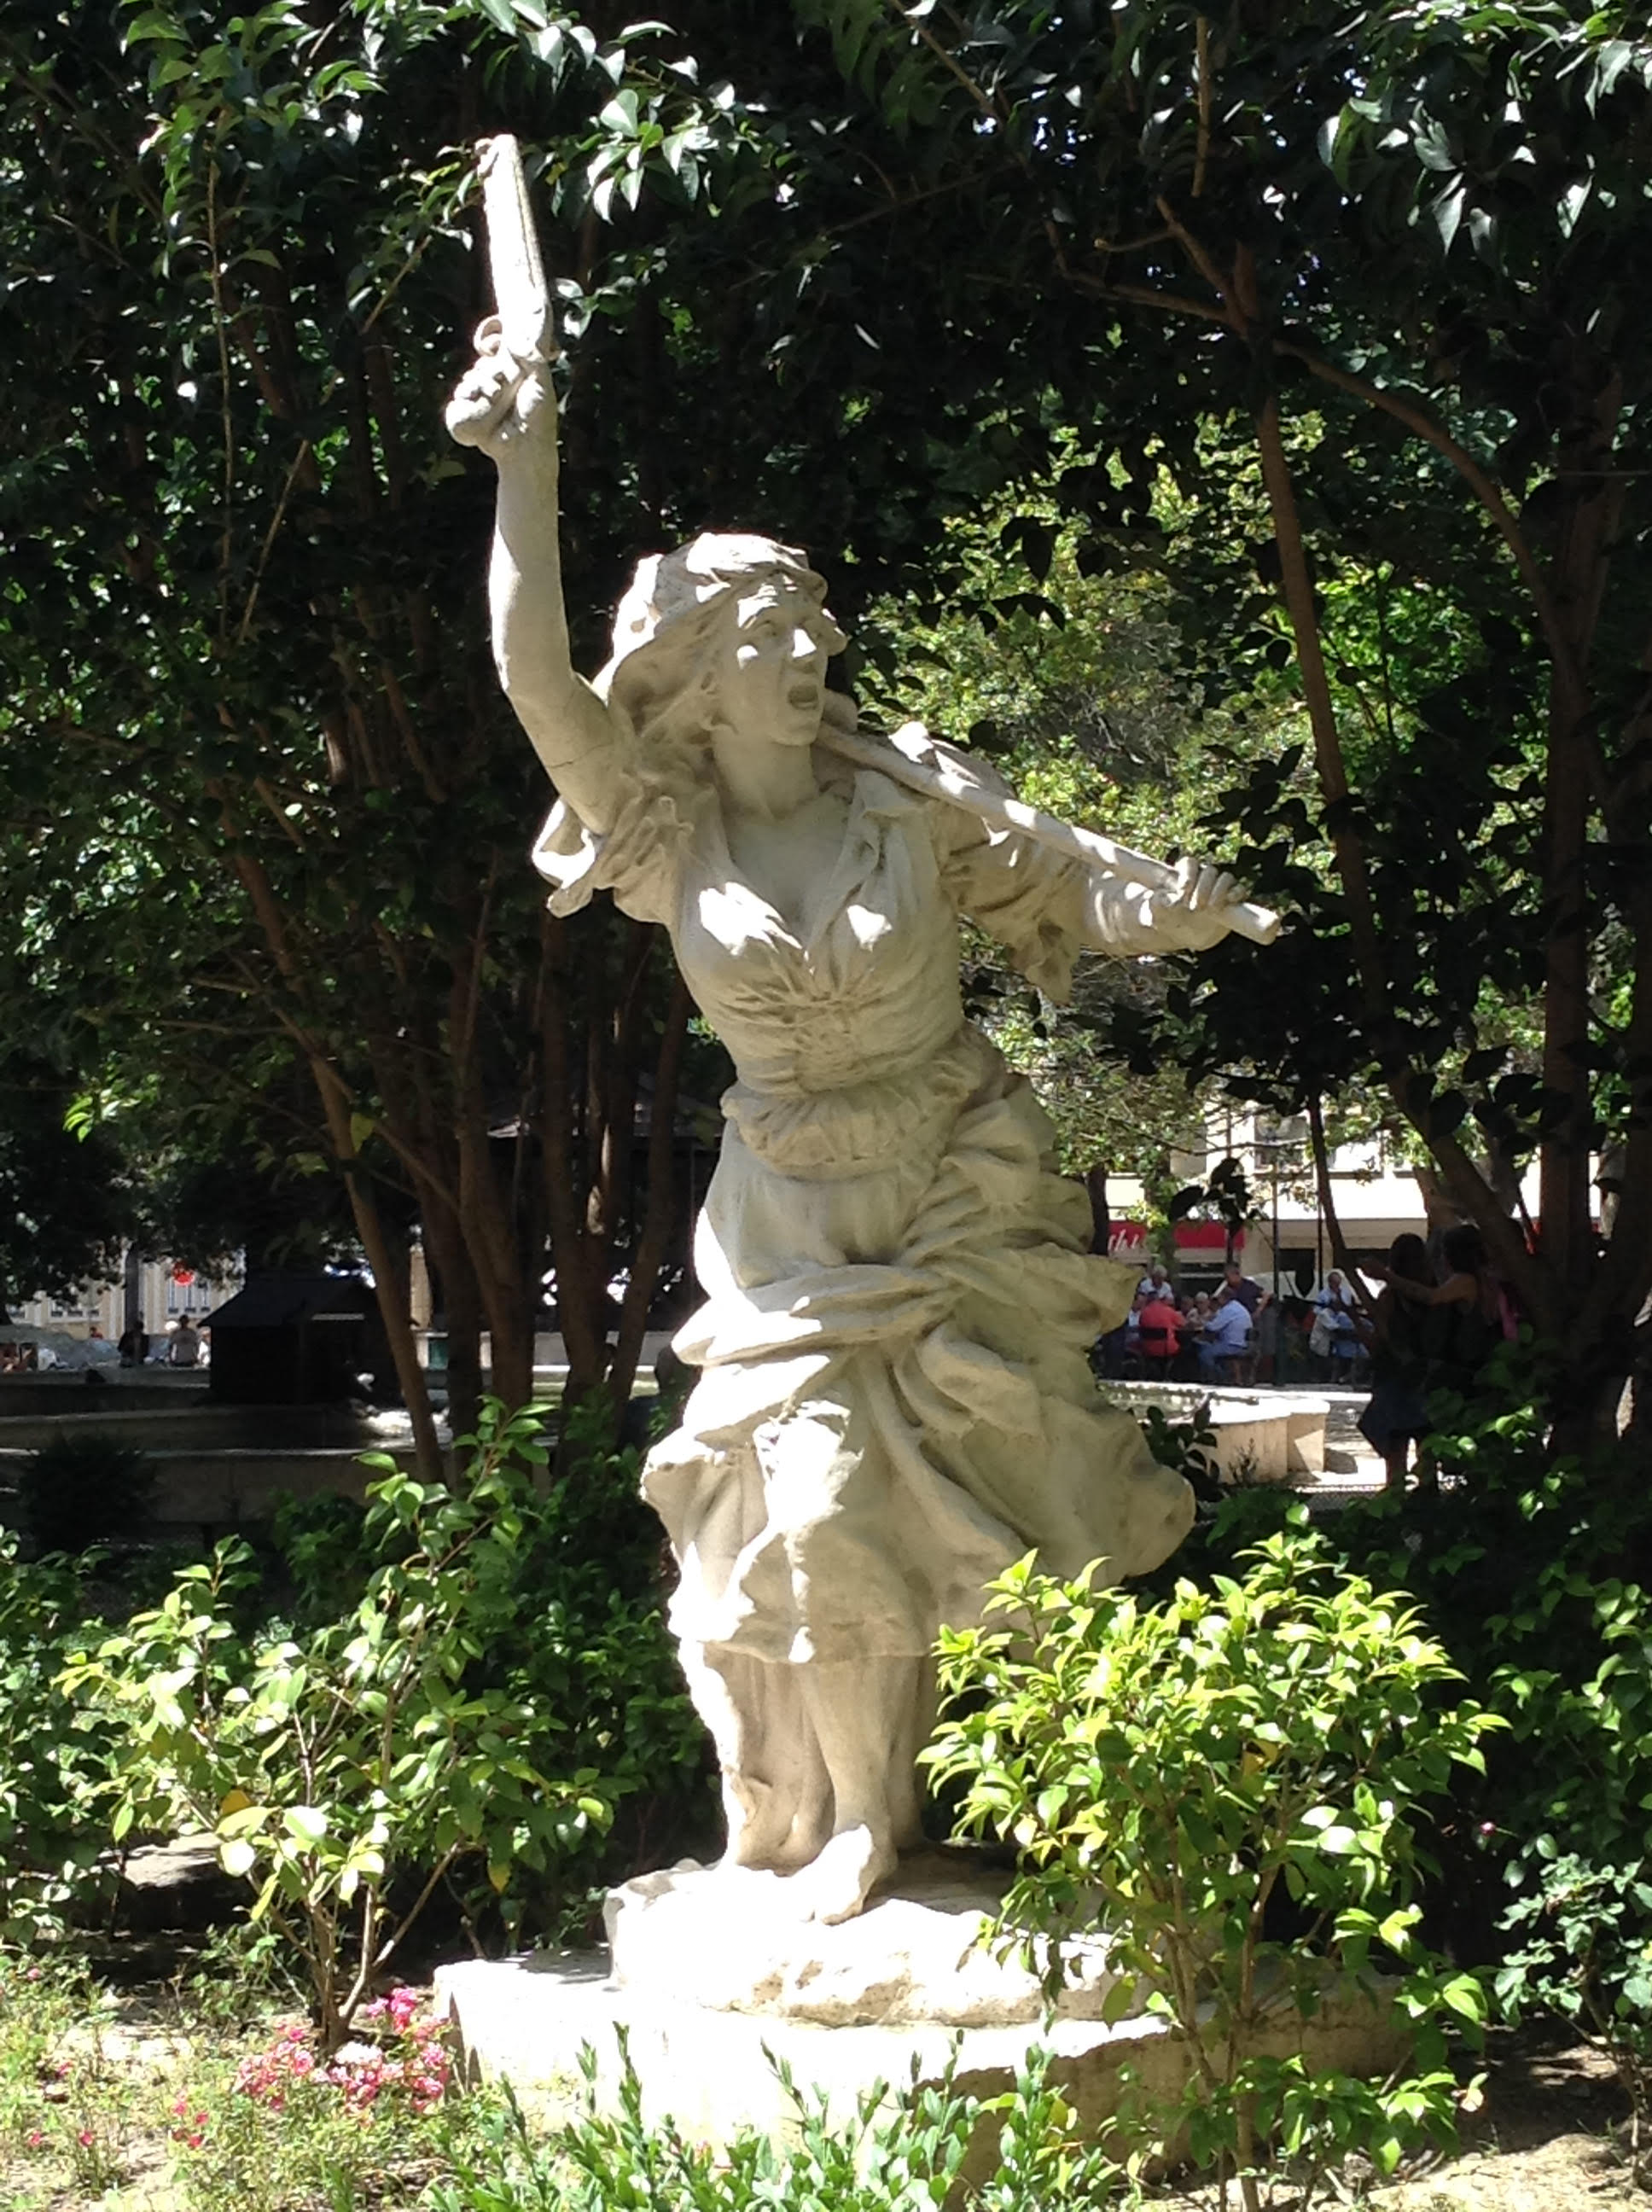 maria da fonte estatuta en parque jardim da parada campo de ourique